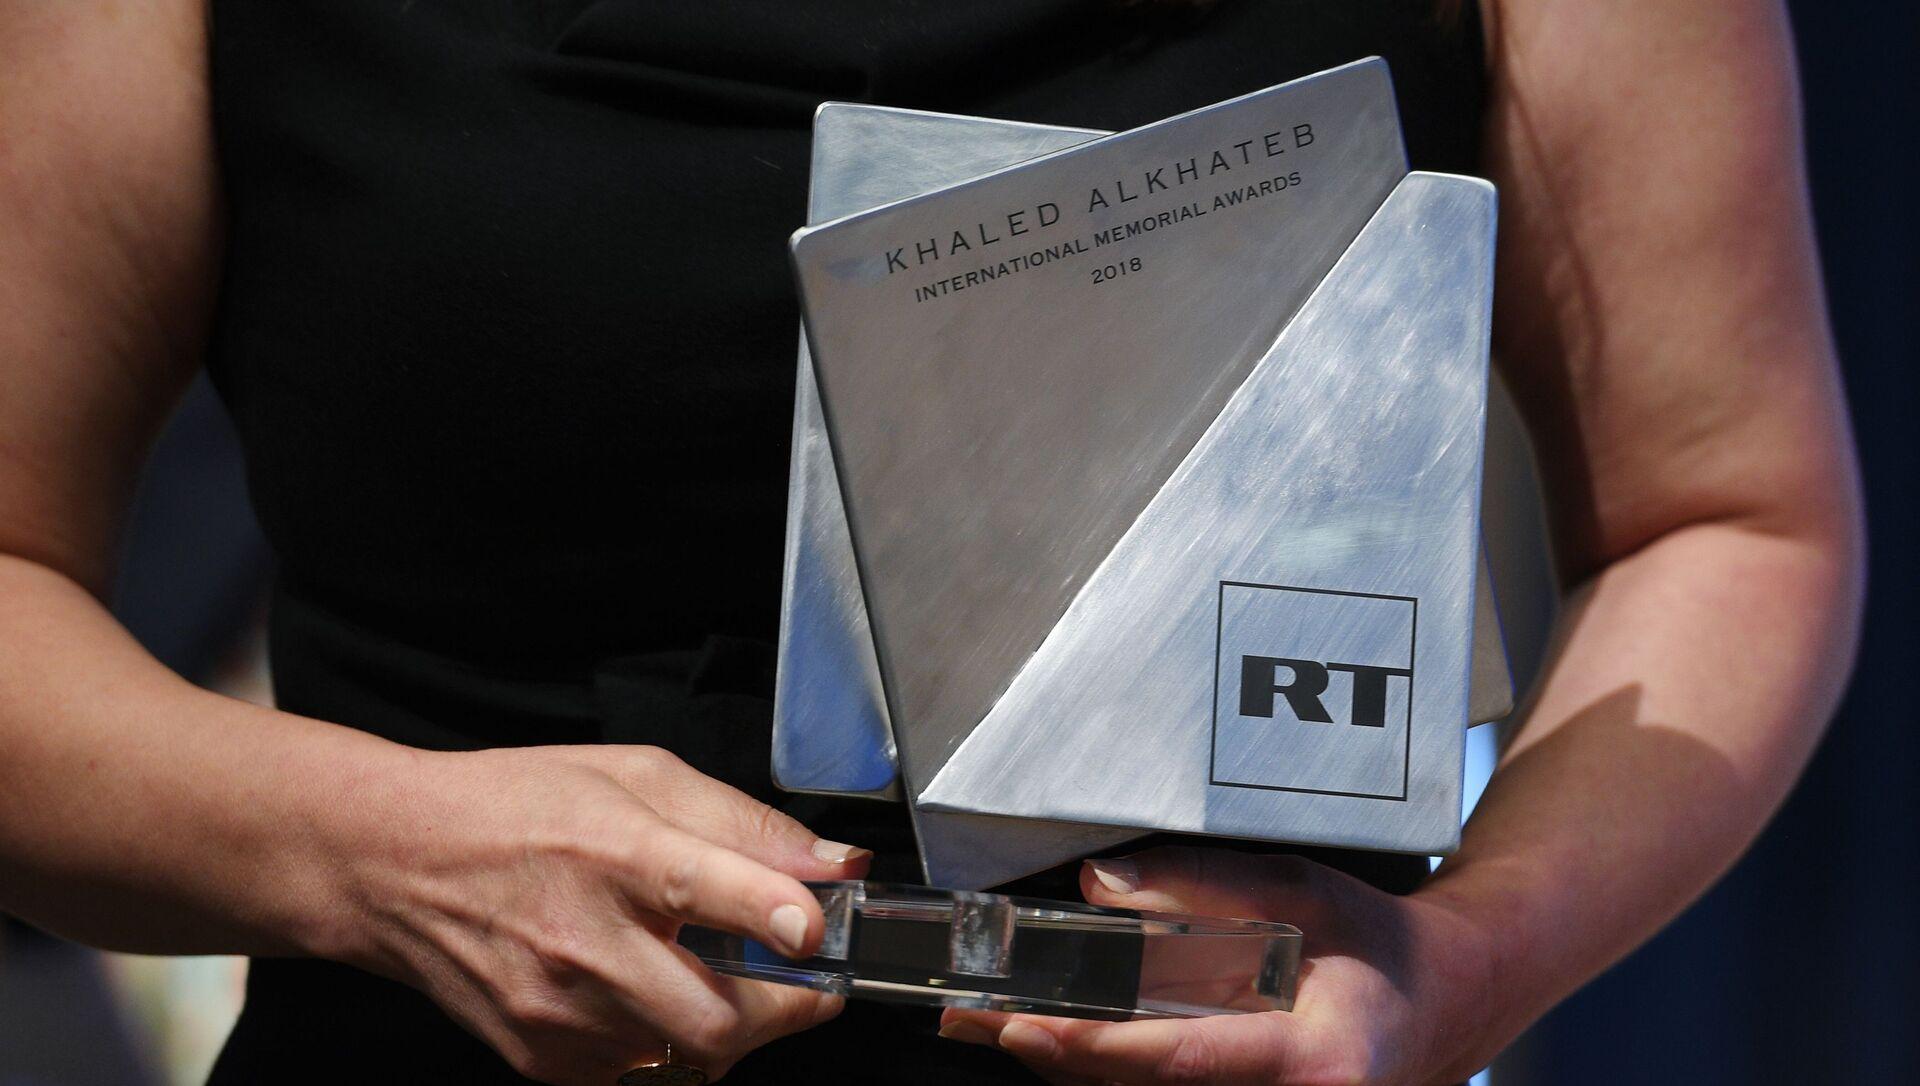 Prix international The Khaled Alkhateb Memorial Awards - Sputnik France, 1920, 30.07.2021